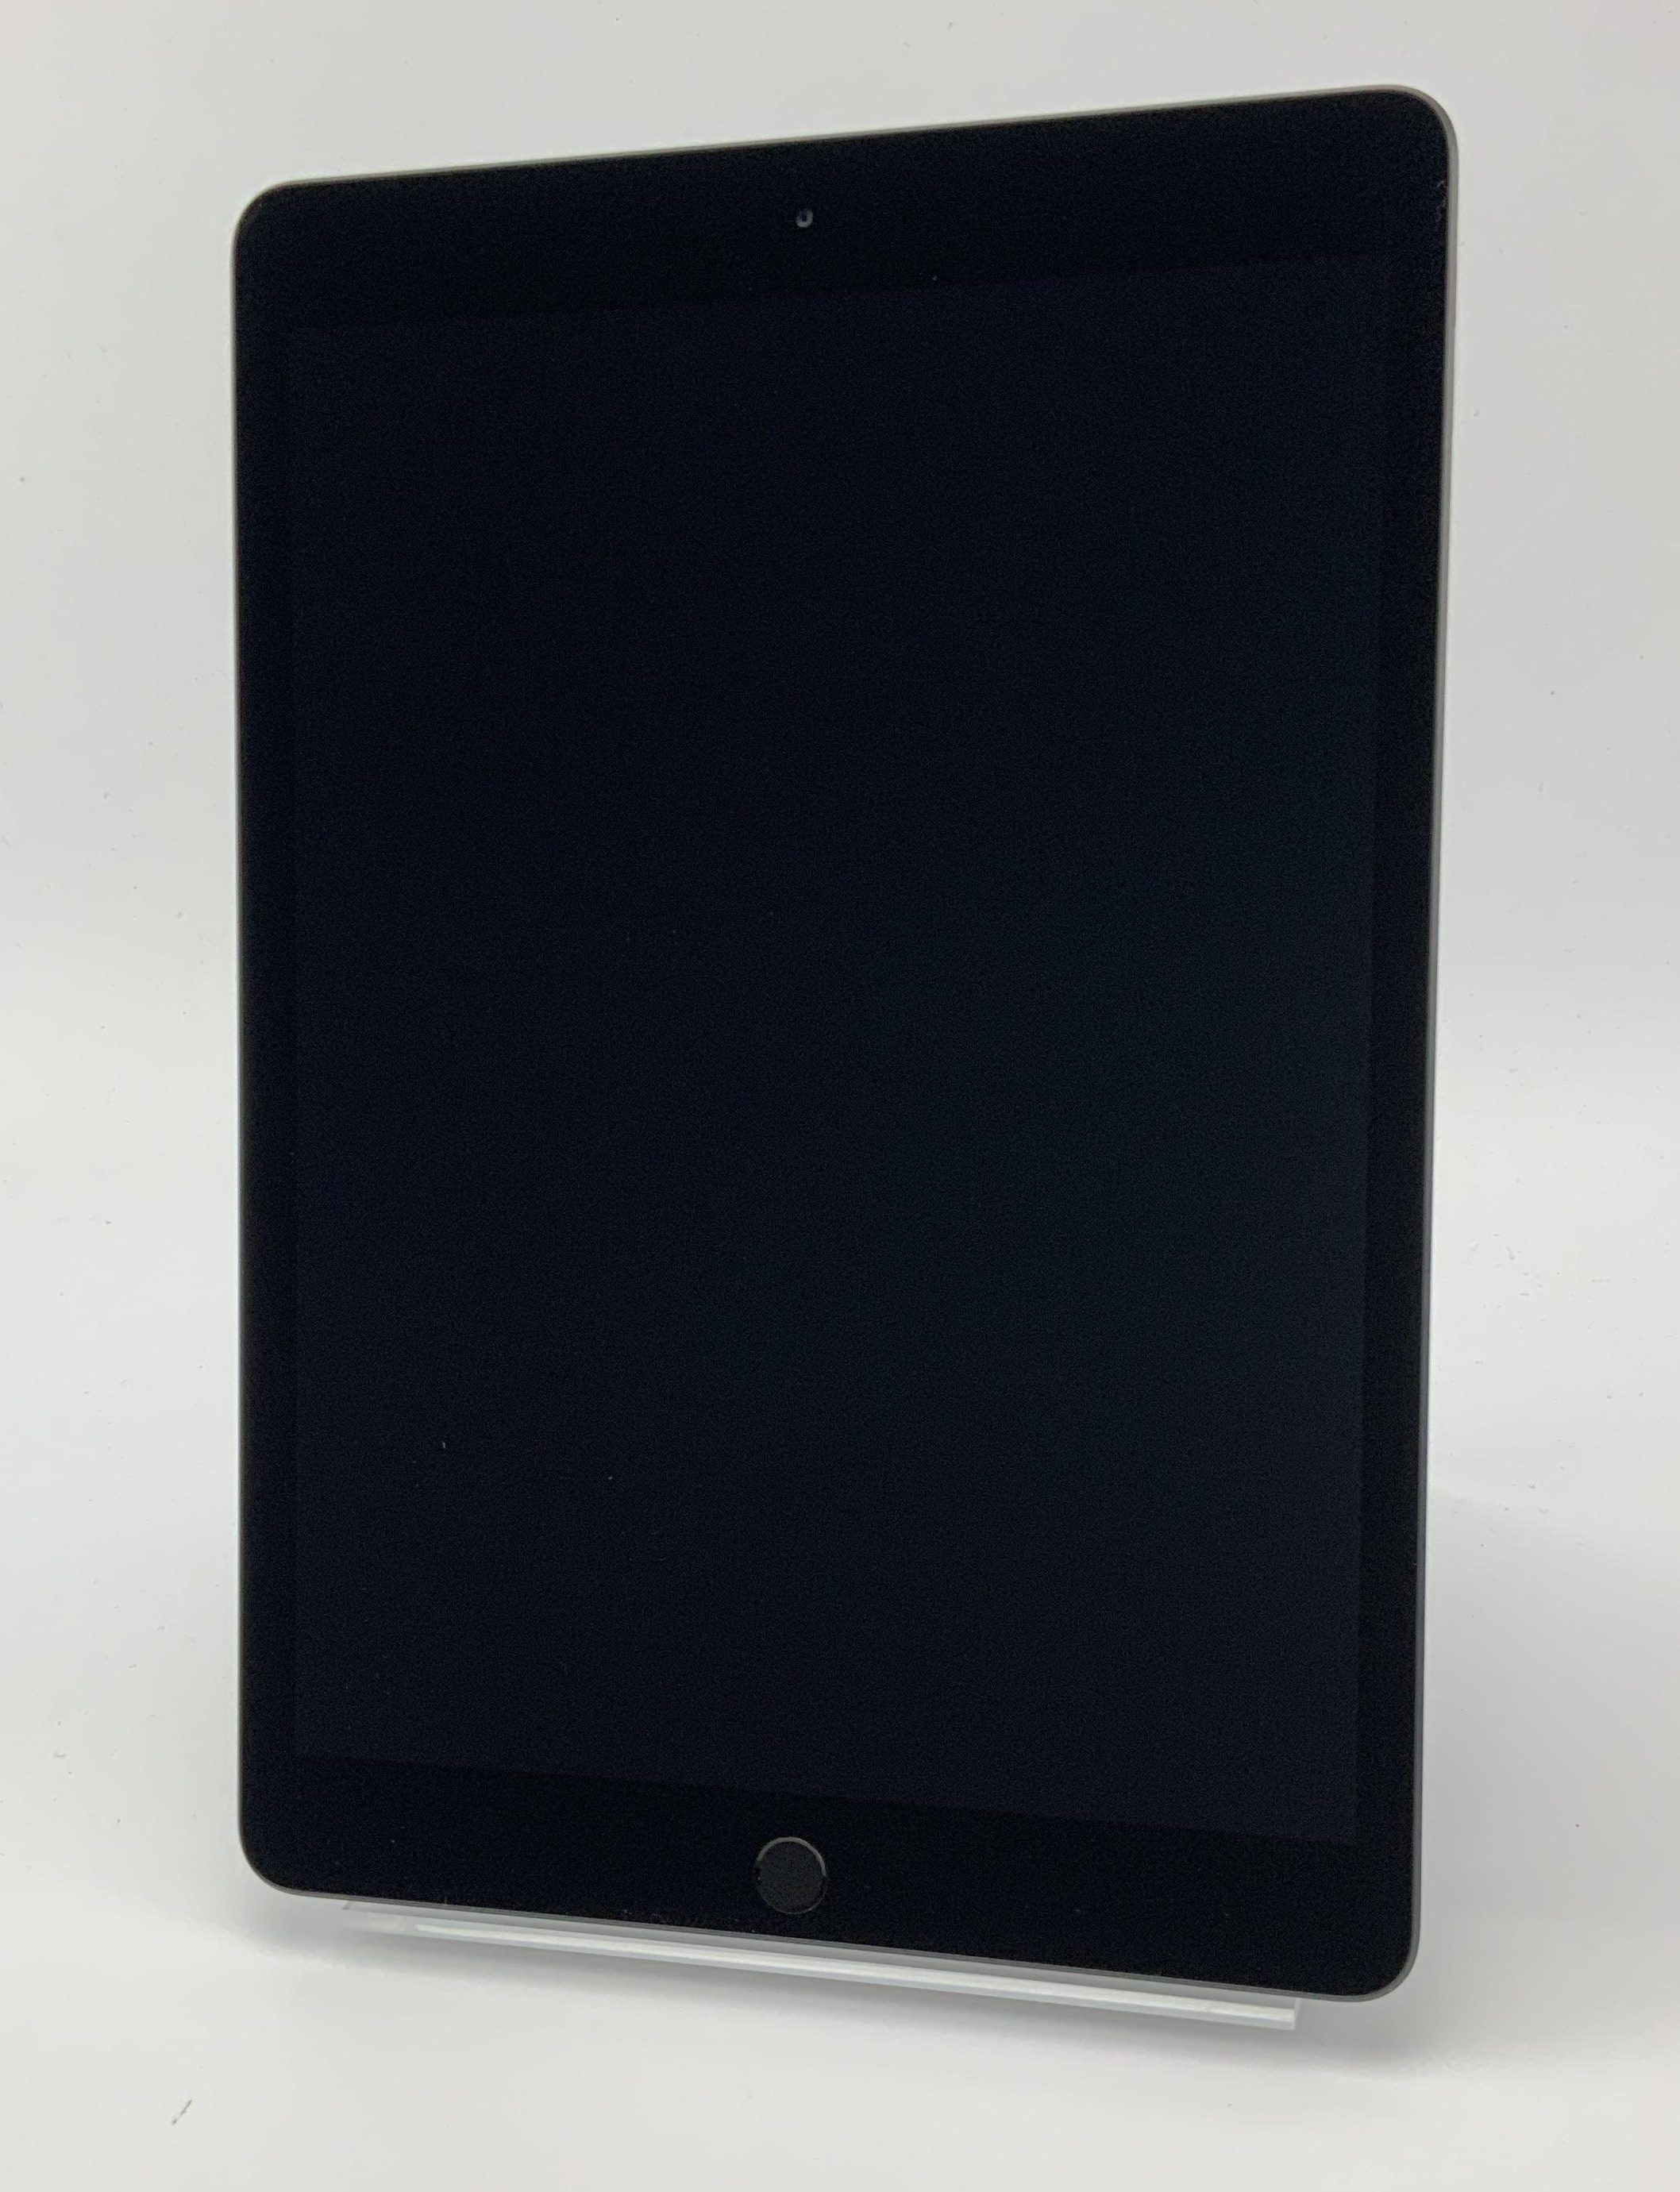 iPad 7 Wi-Fi 32GB, 32GB, Space Gray, bild 1